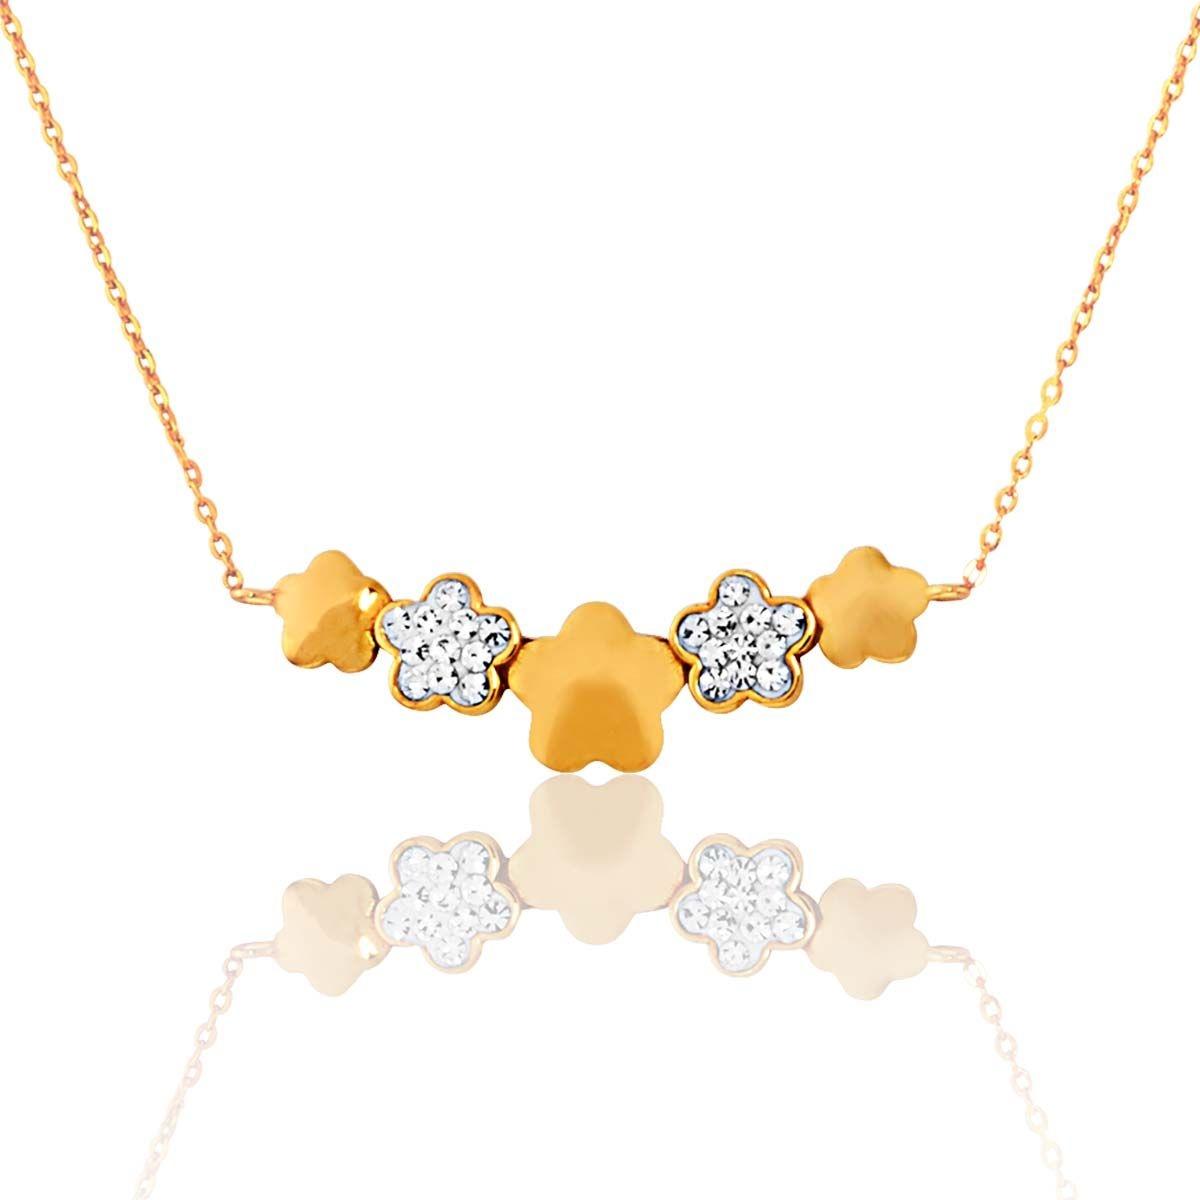 Collier en Or 375/1000 Cristal